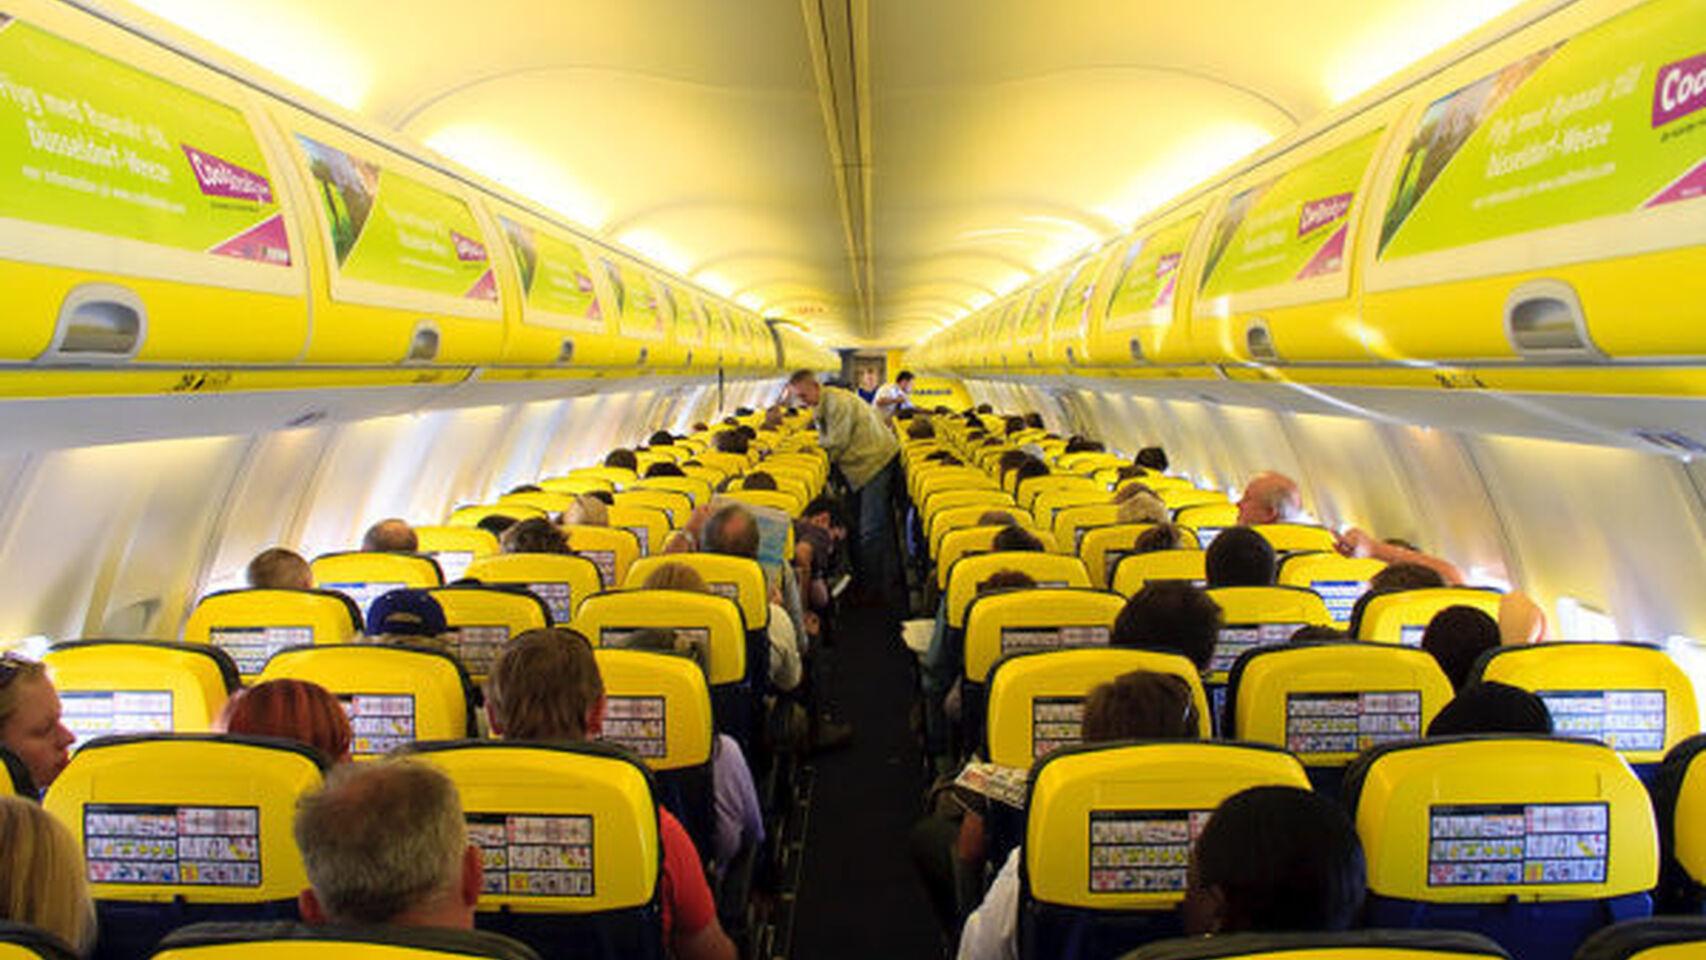 Reino Unido también impondrá cuarentena a viajeros extranjeros